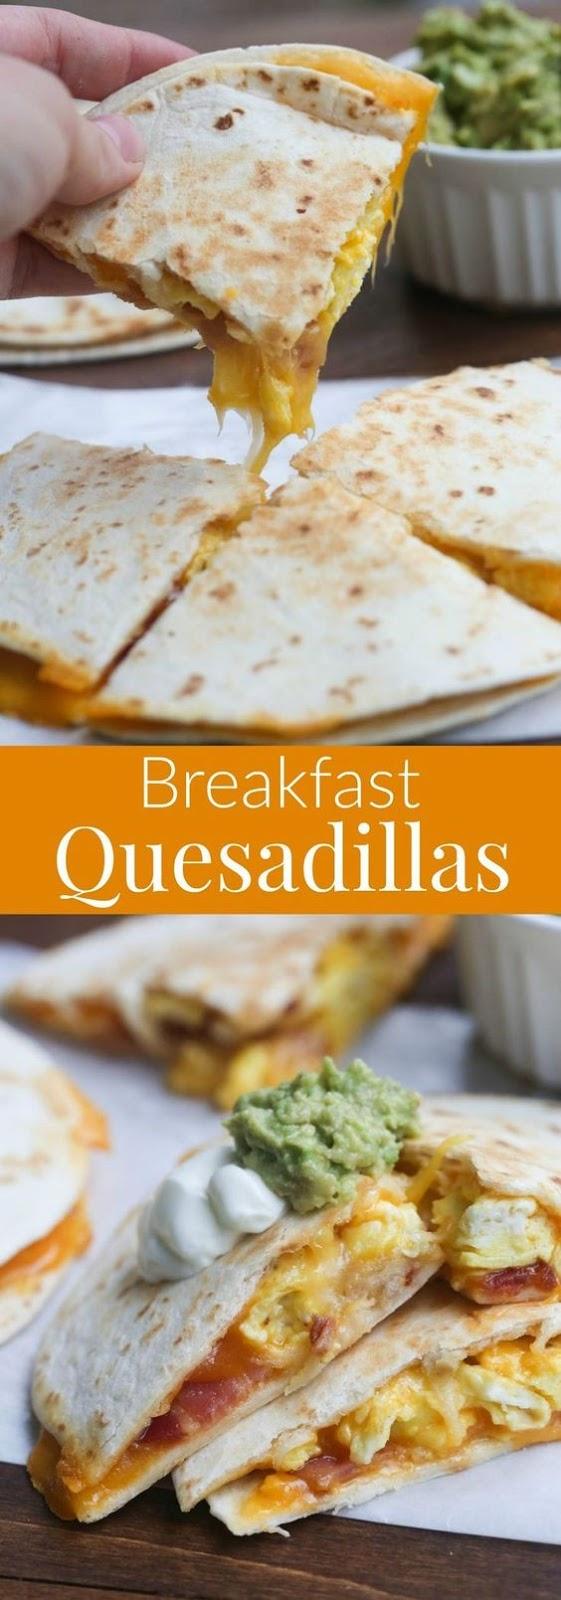 Breakfast Quesadillas #american #breakfast #quesadillas